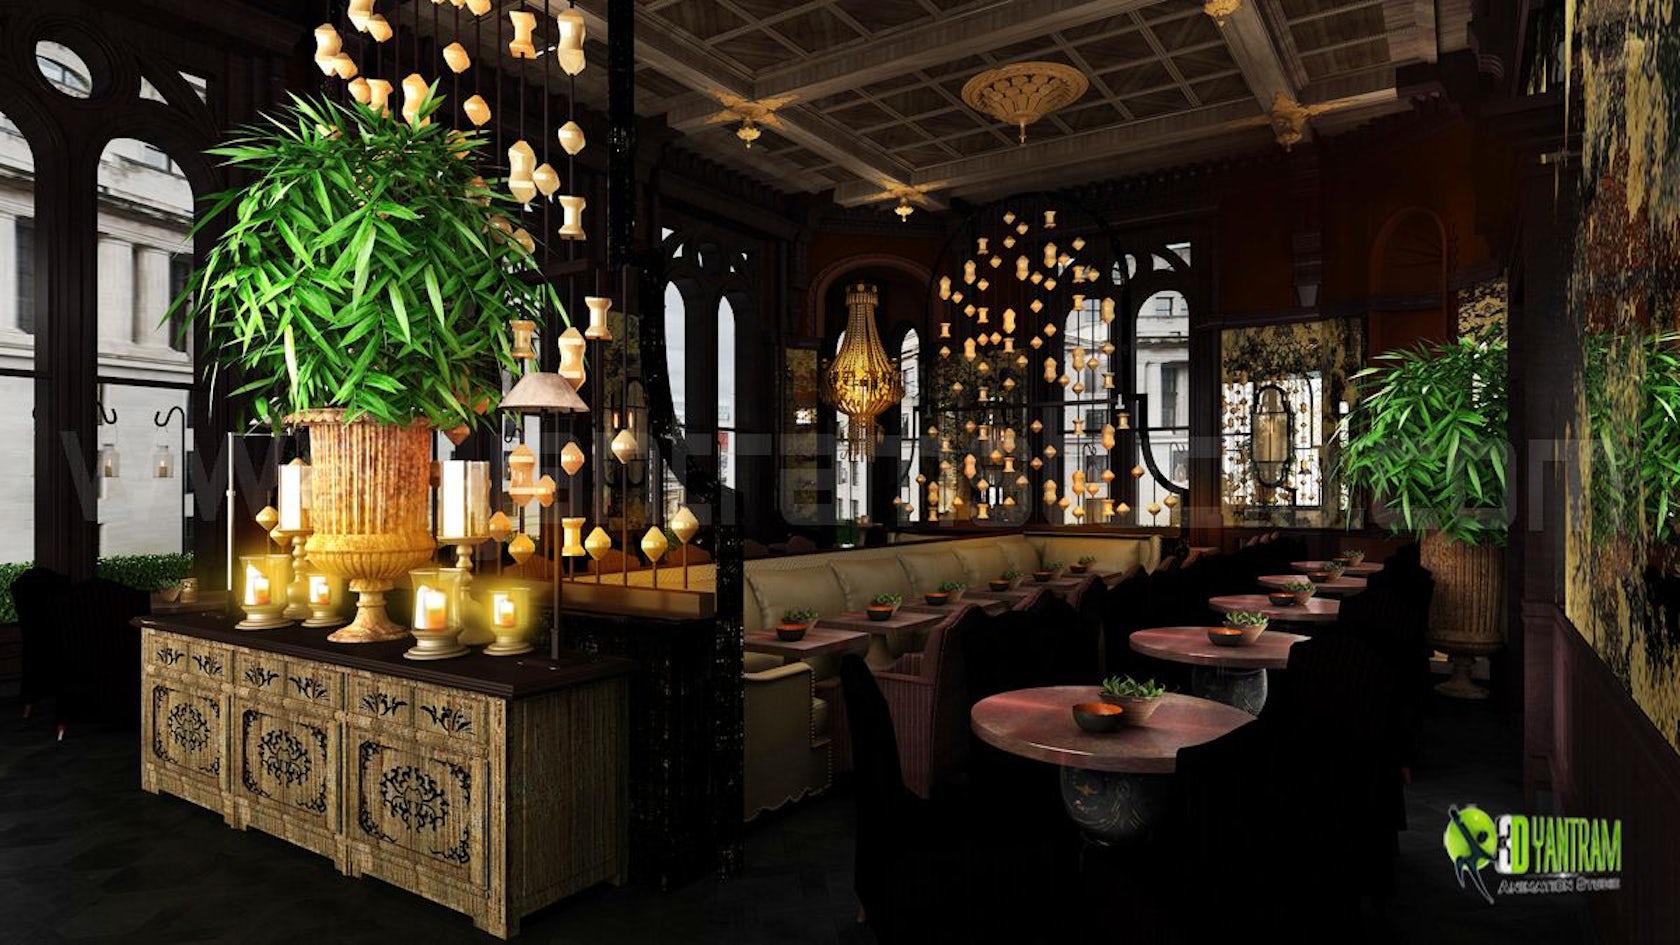 Decorative Classic Restaurant Interior Night View On Architizer